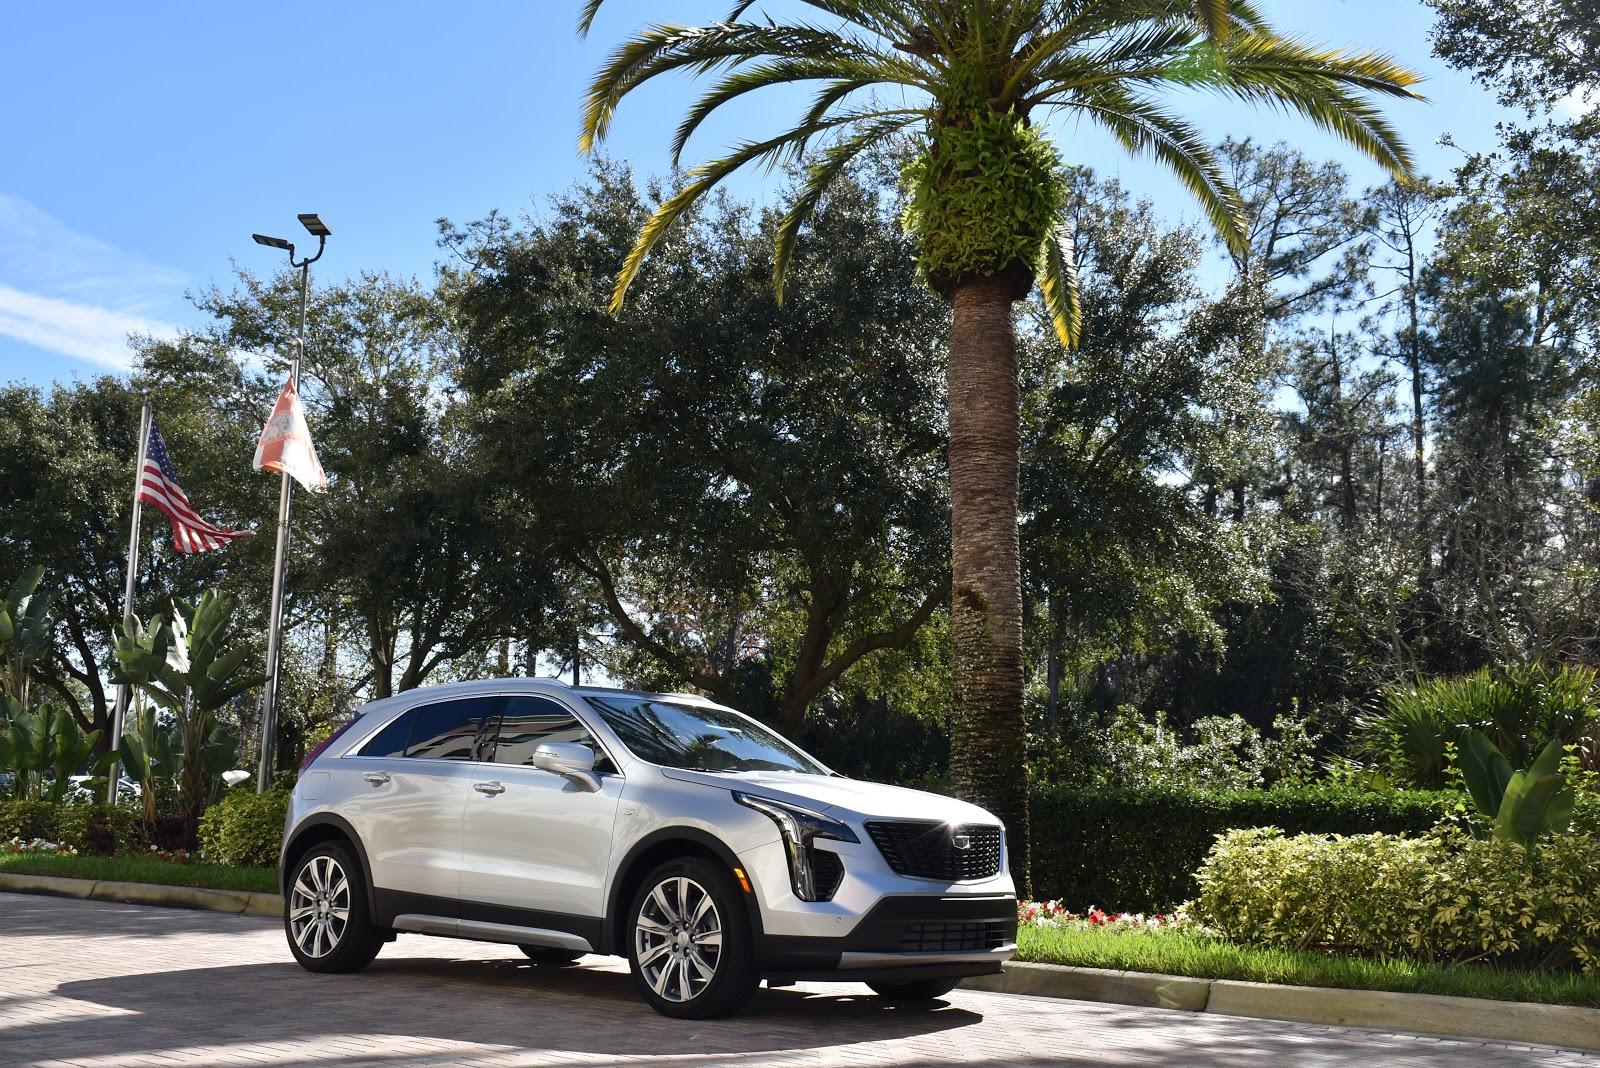 2020 Cadillac XT4 in Orlando Florida